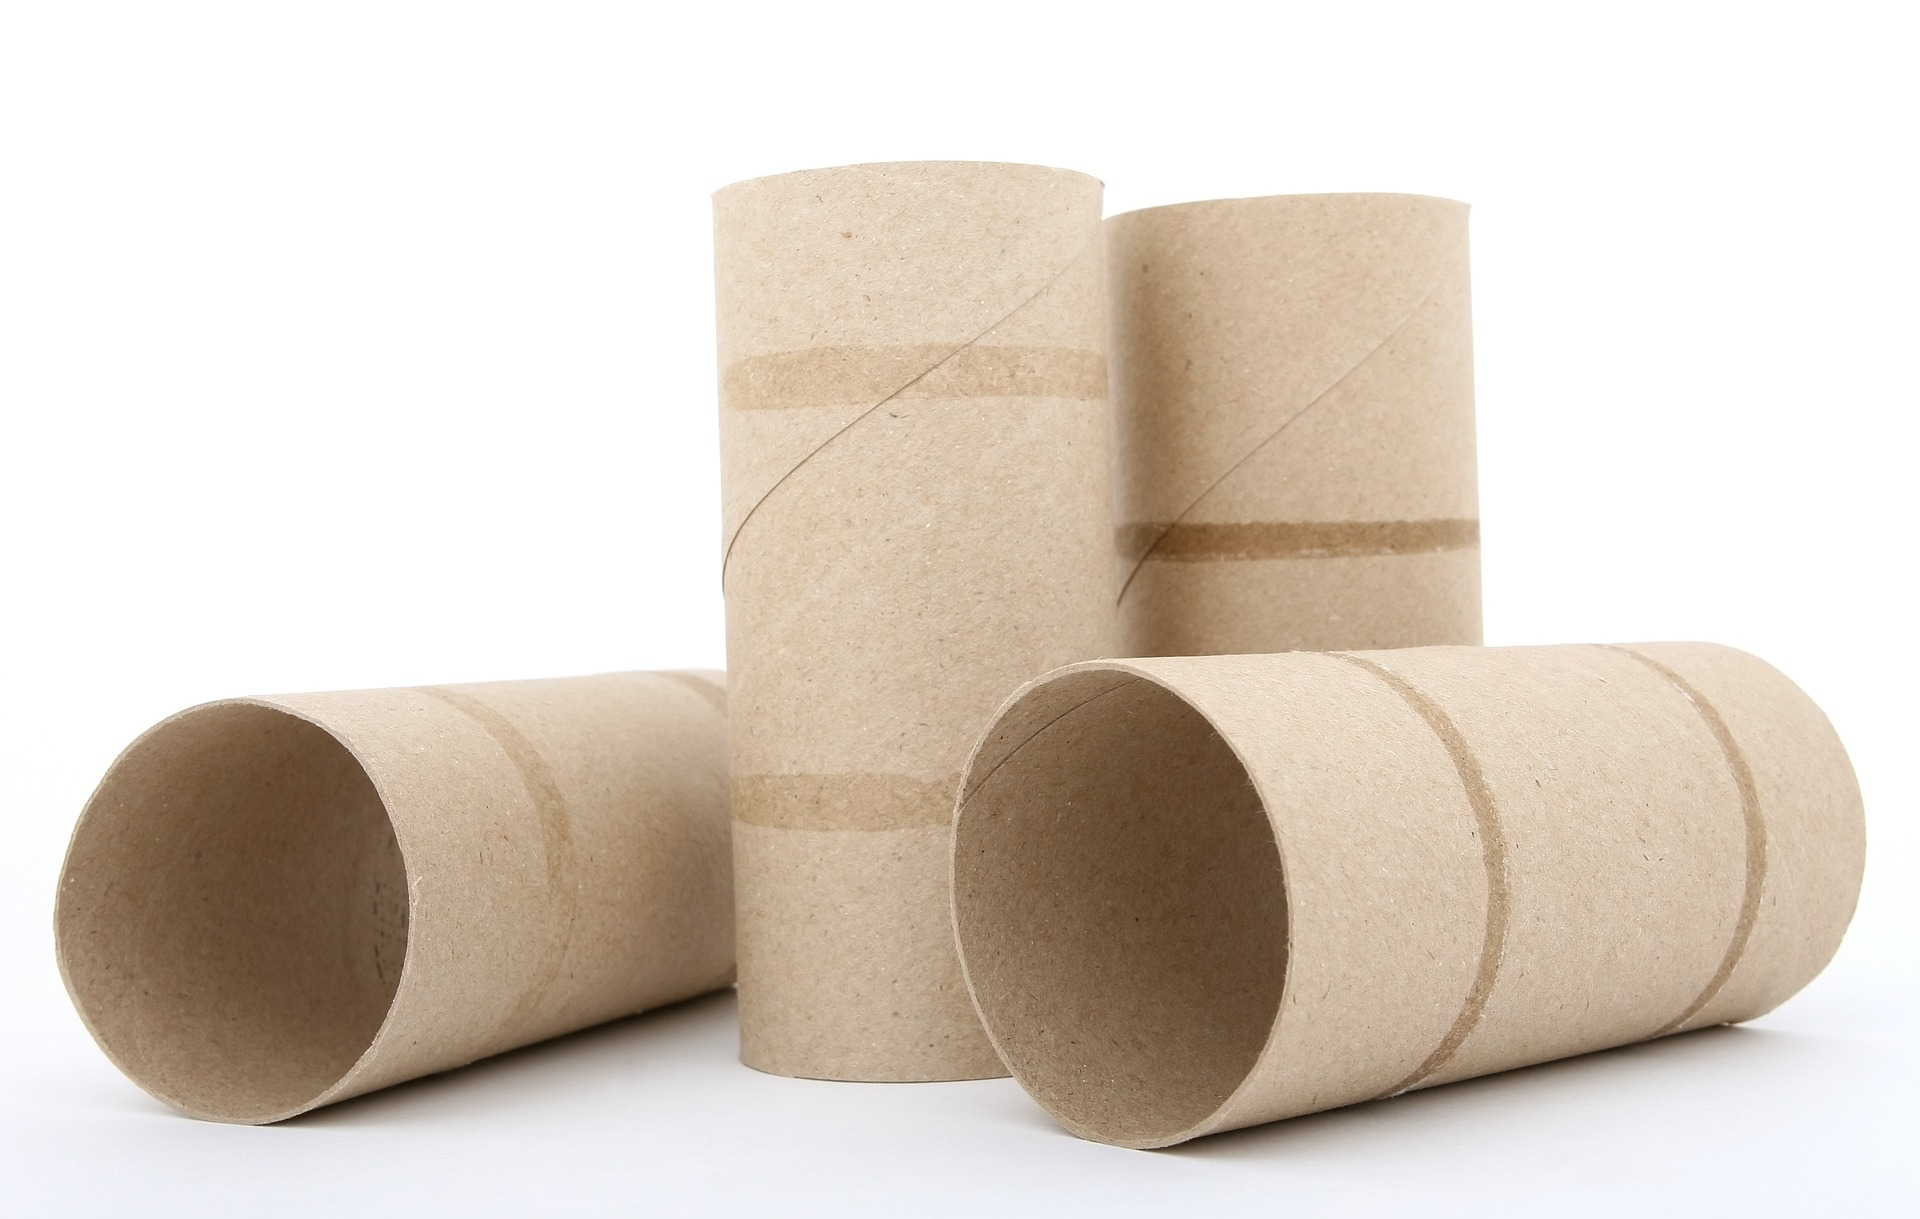 9/No toilet paper